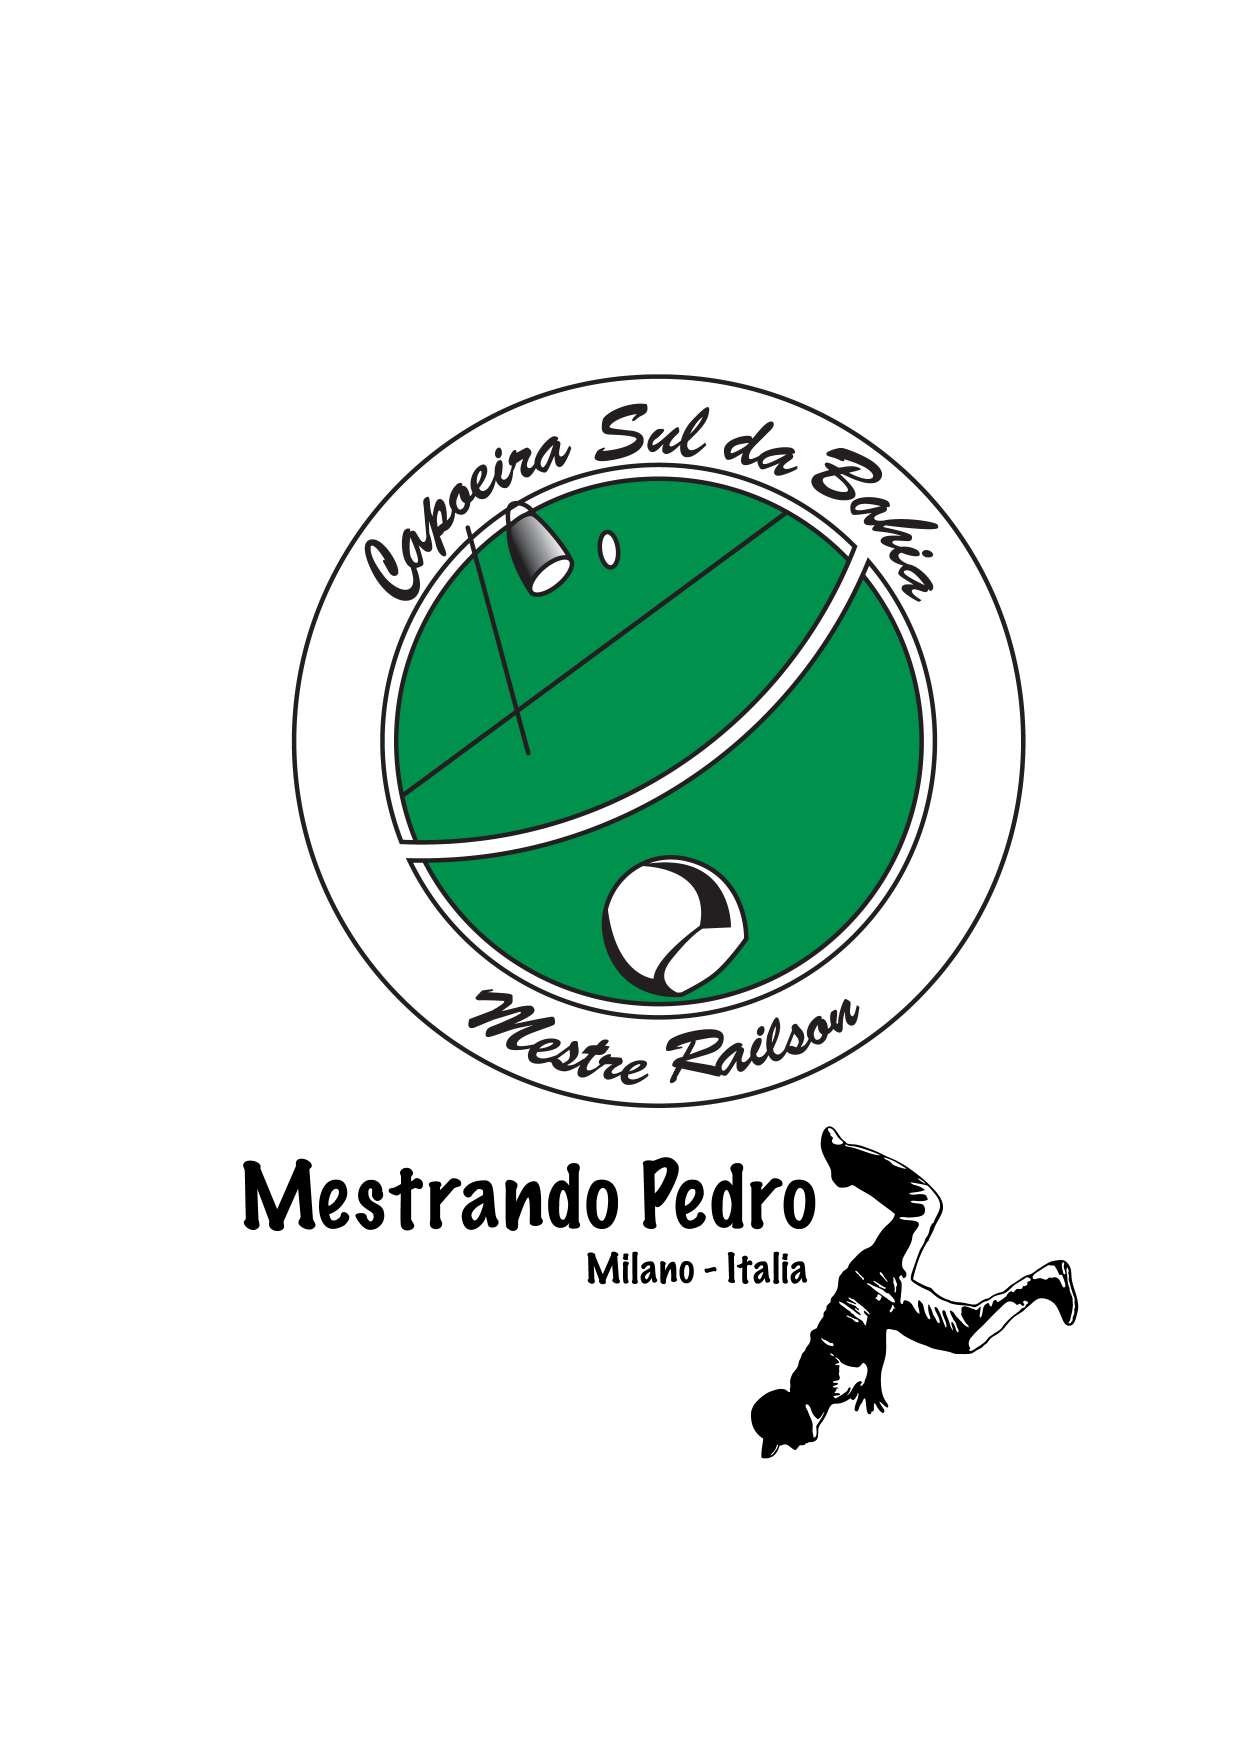 Capoeira Sul da Bahia Logo